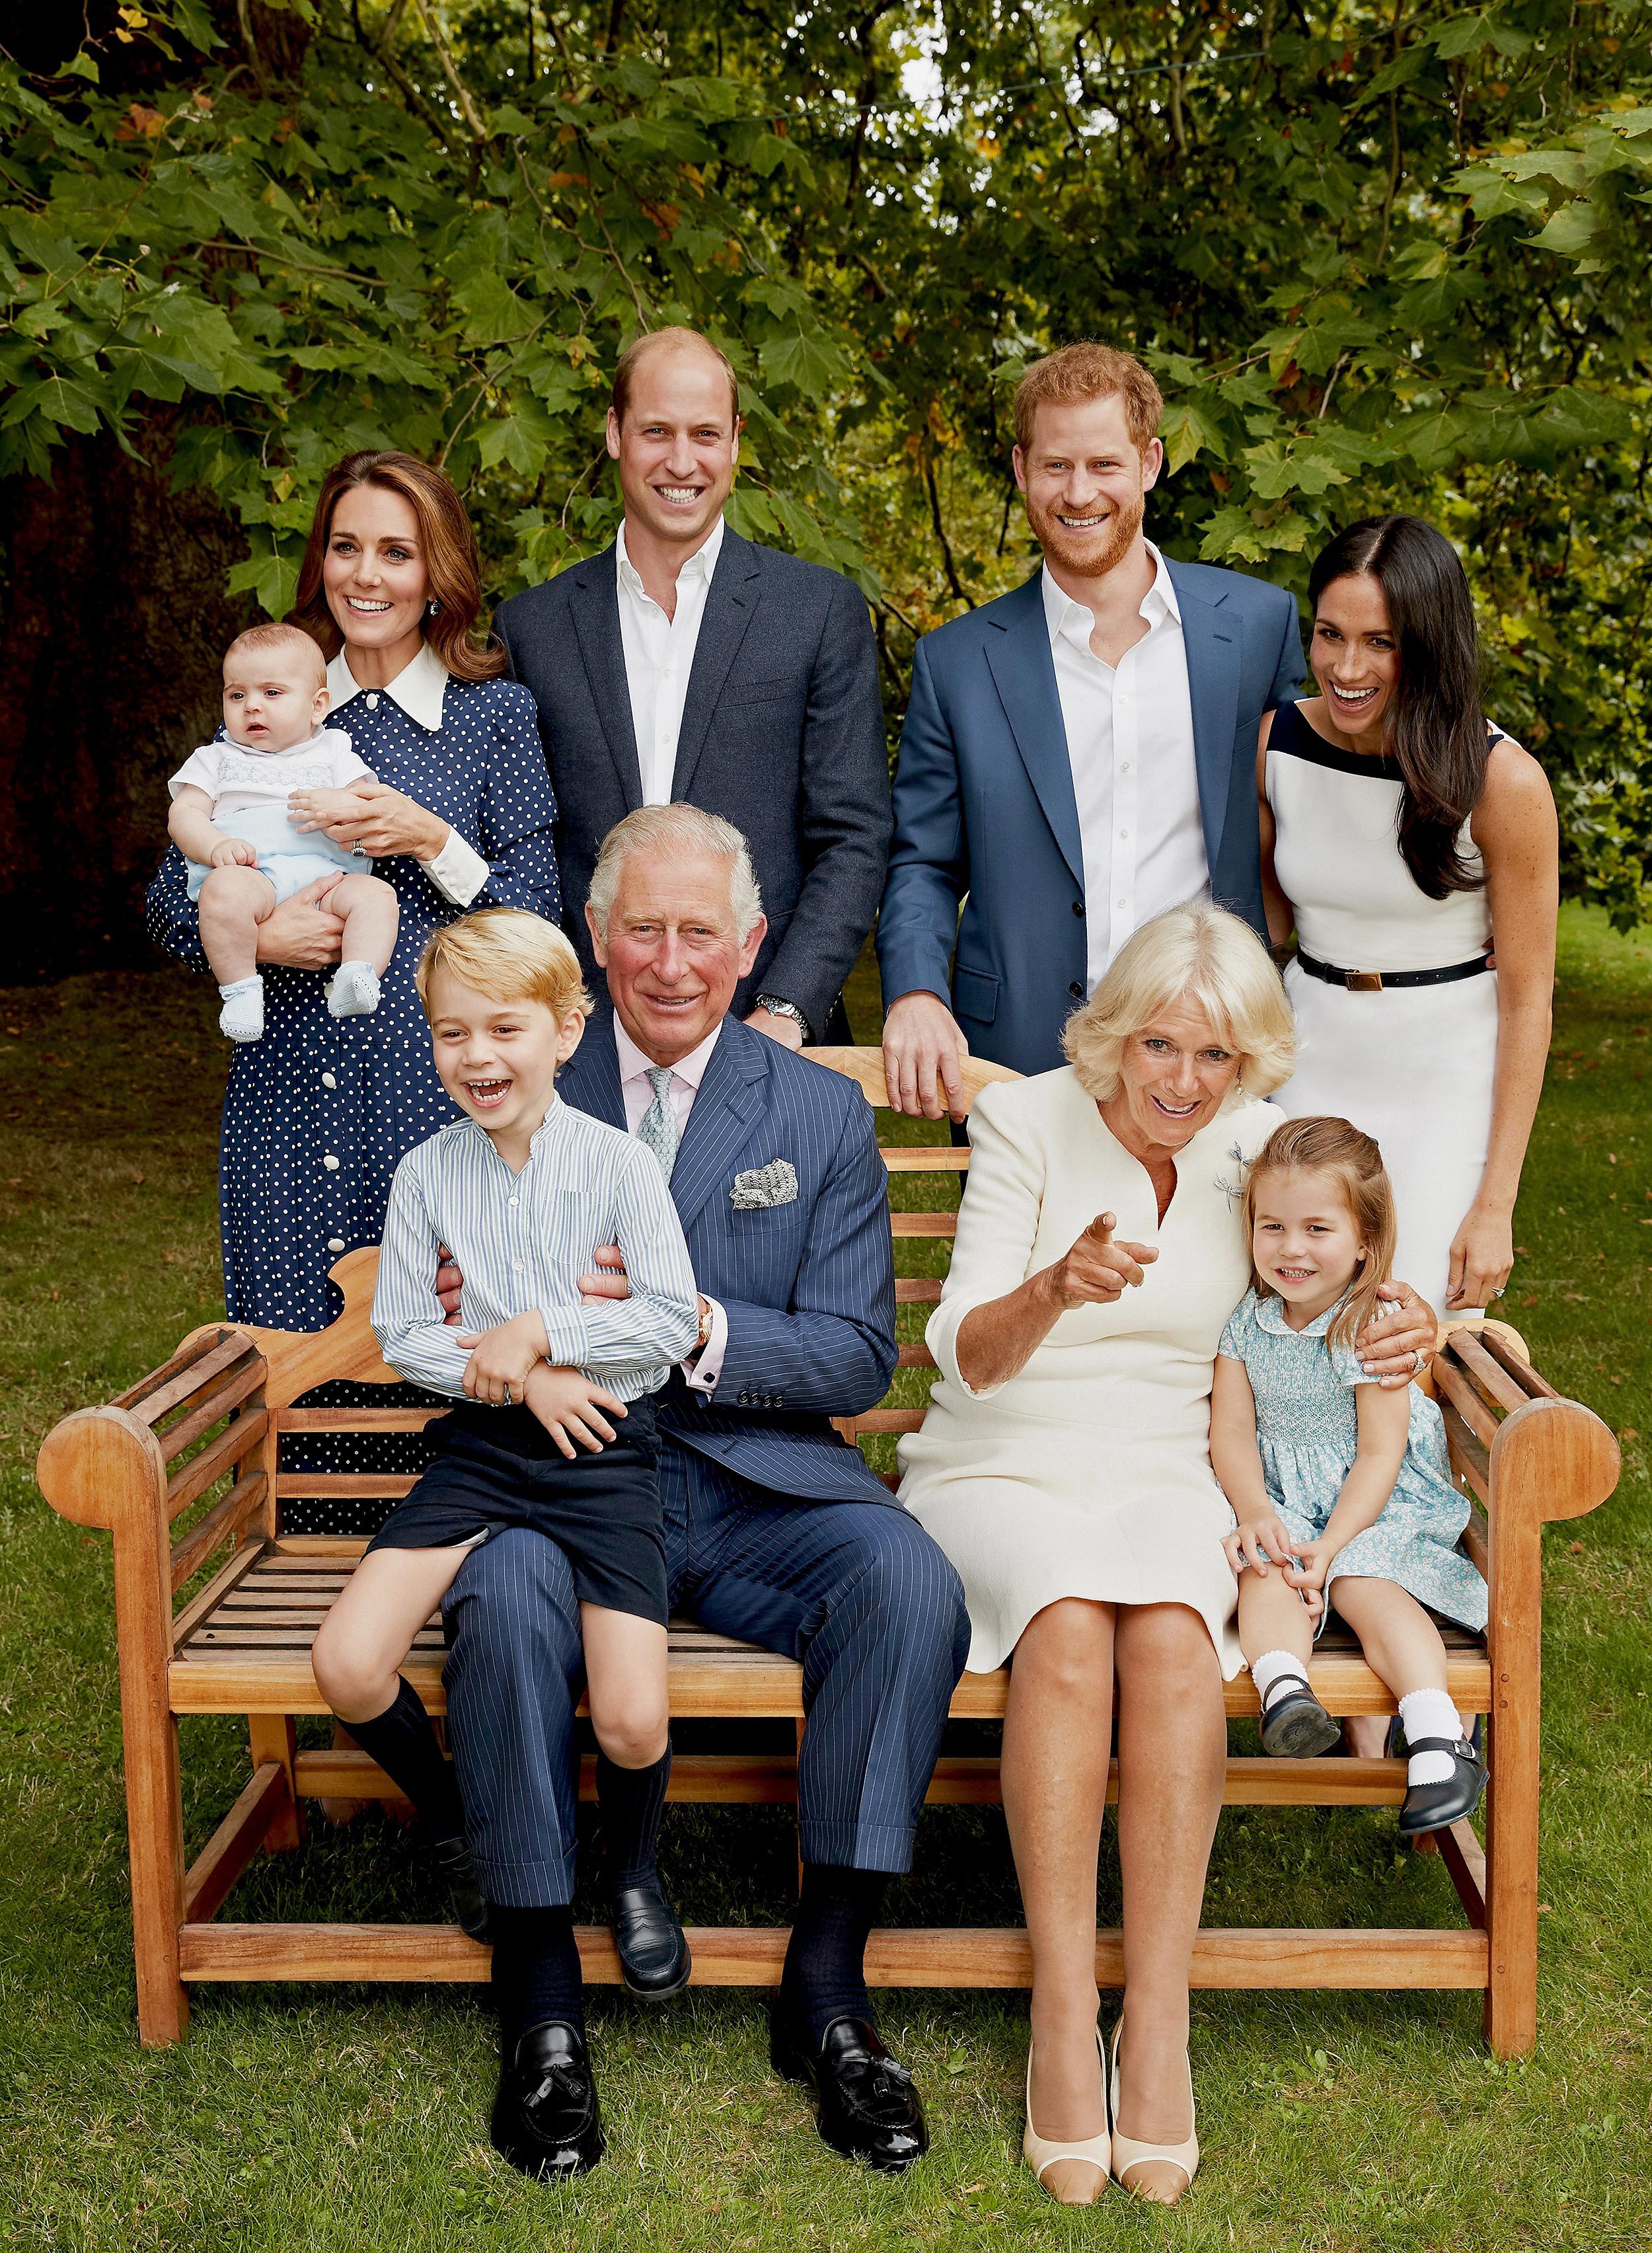 Kate Middleton channels Princess Diana with polka-dot dress